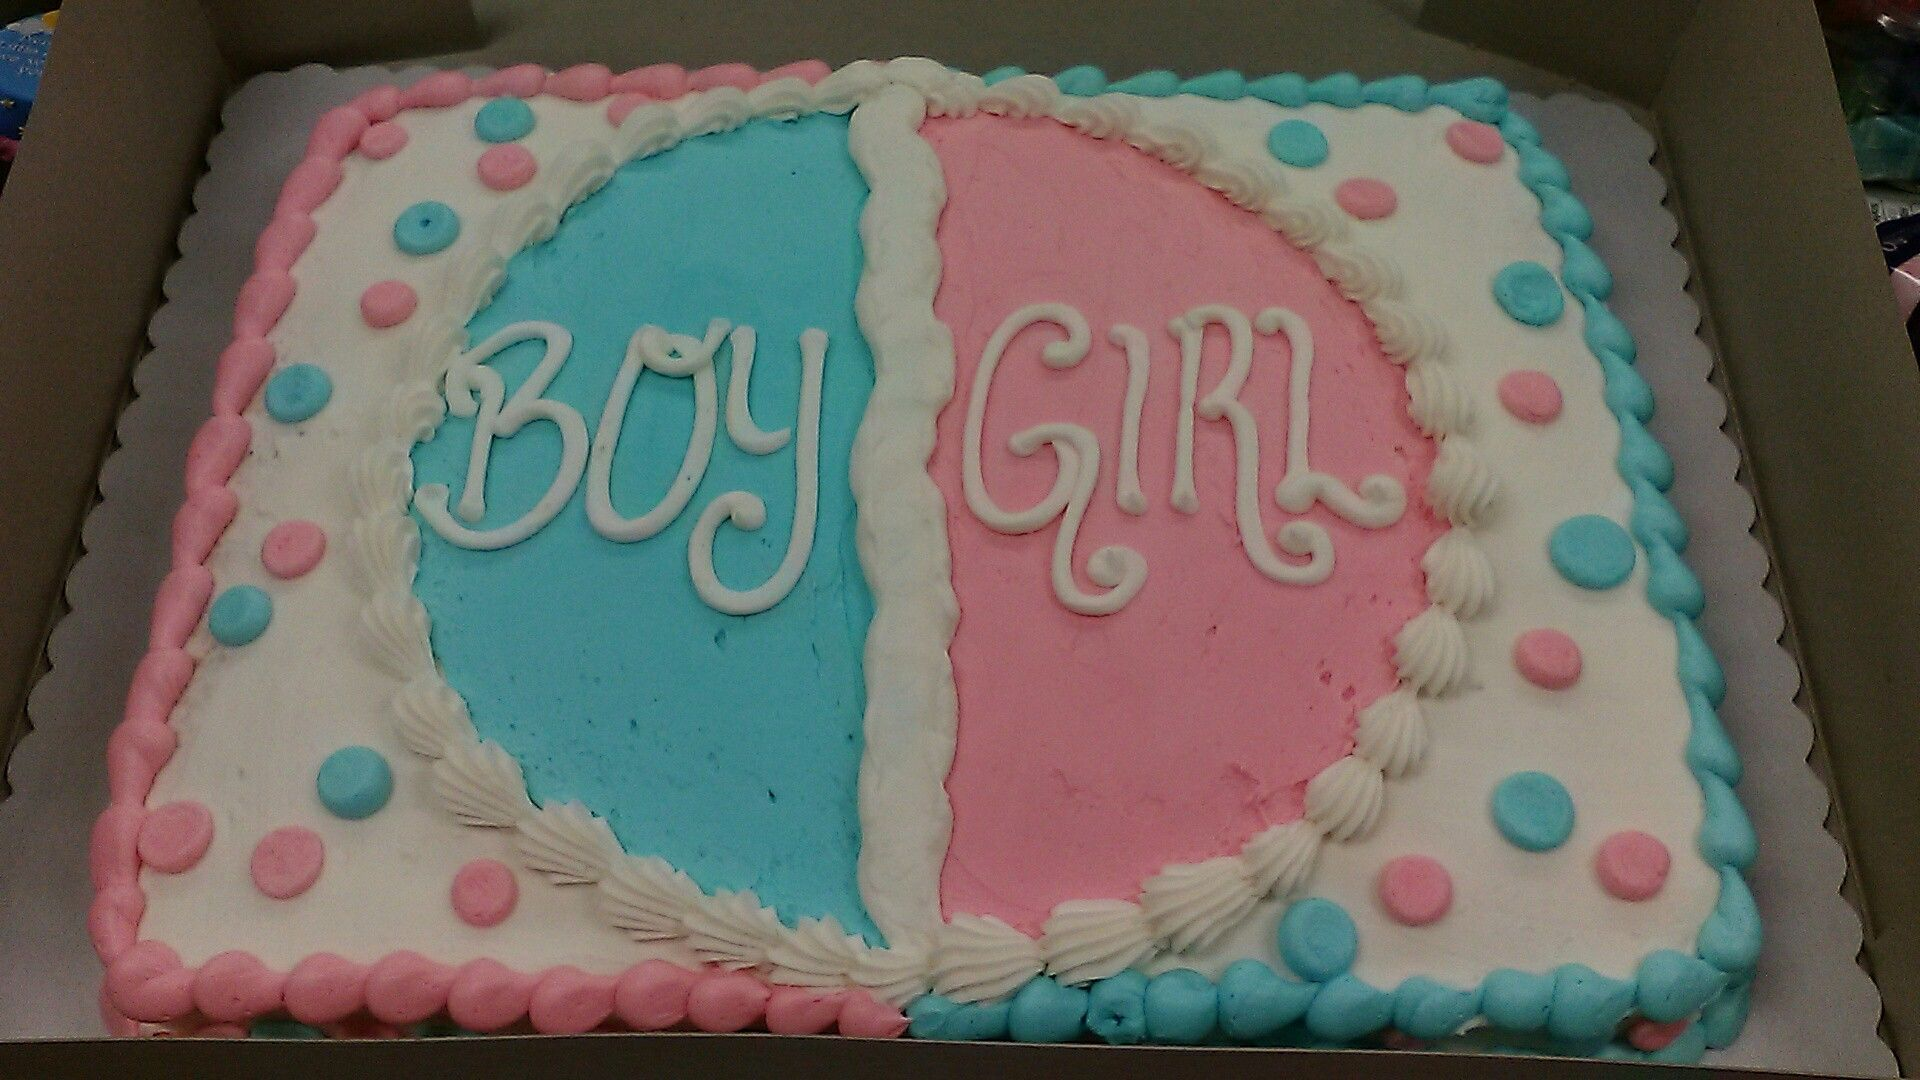 Buttercream Sheet Cake Gender Reveal Idea Light Pink And Light Blue Polka Dots Gender Reveal Cake Simple Gender Reveal Gender Reveal Cupcakes